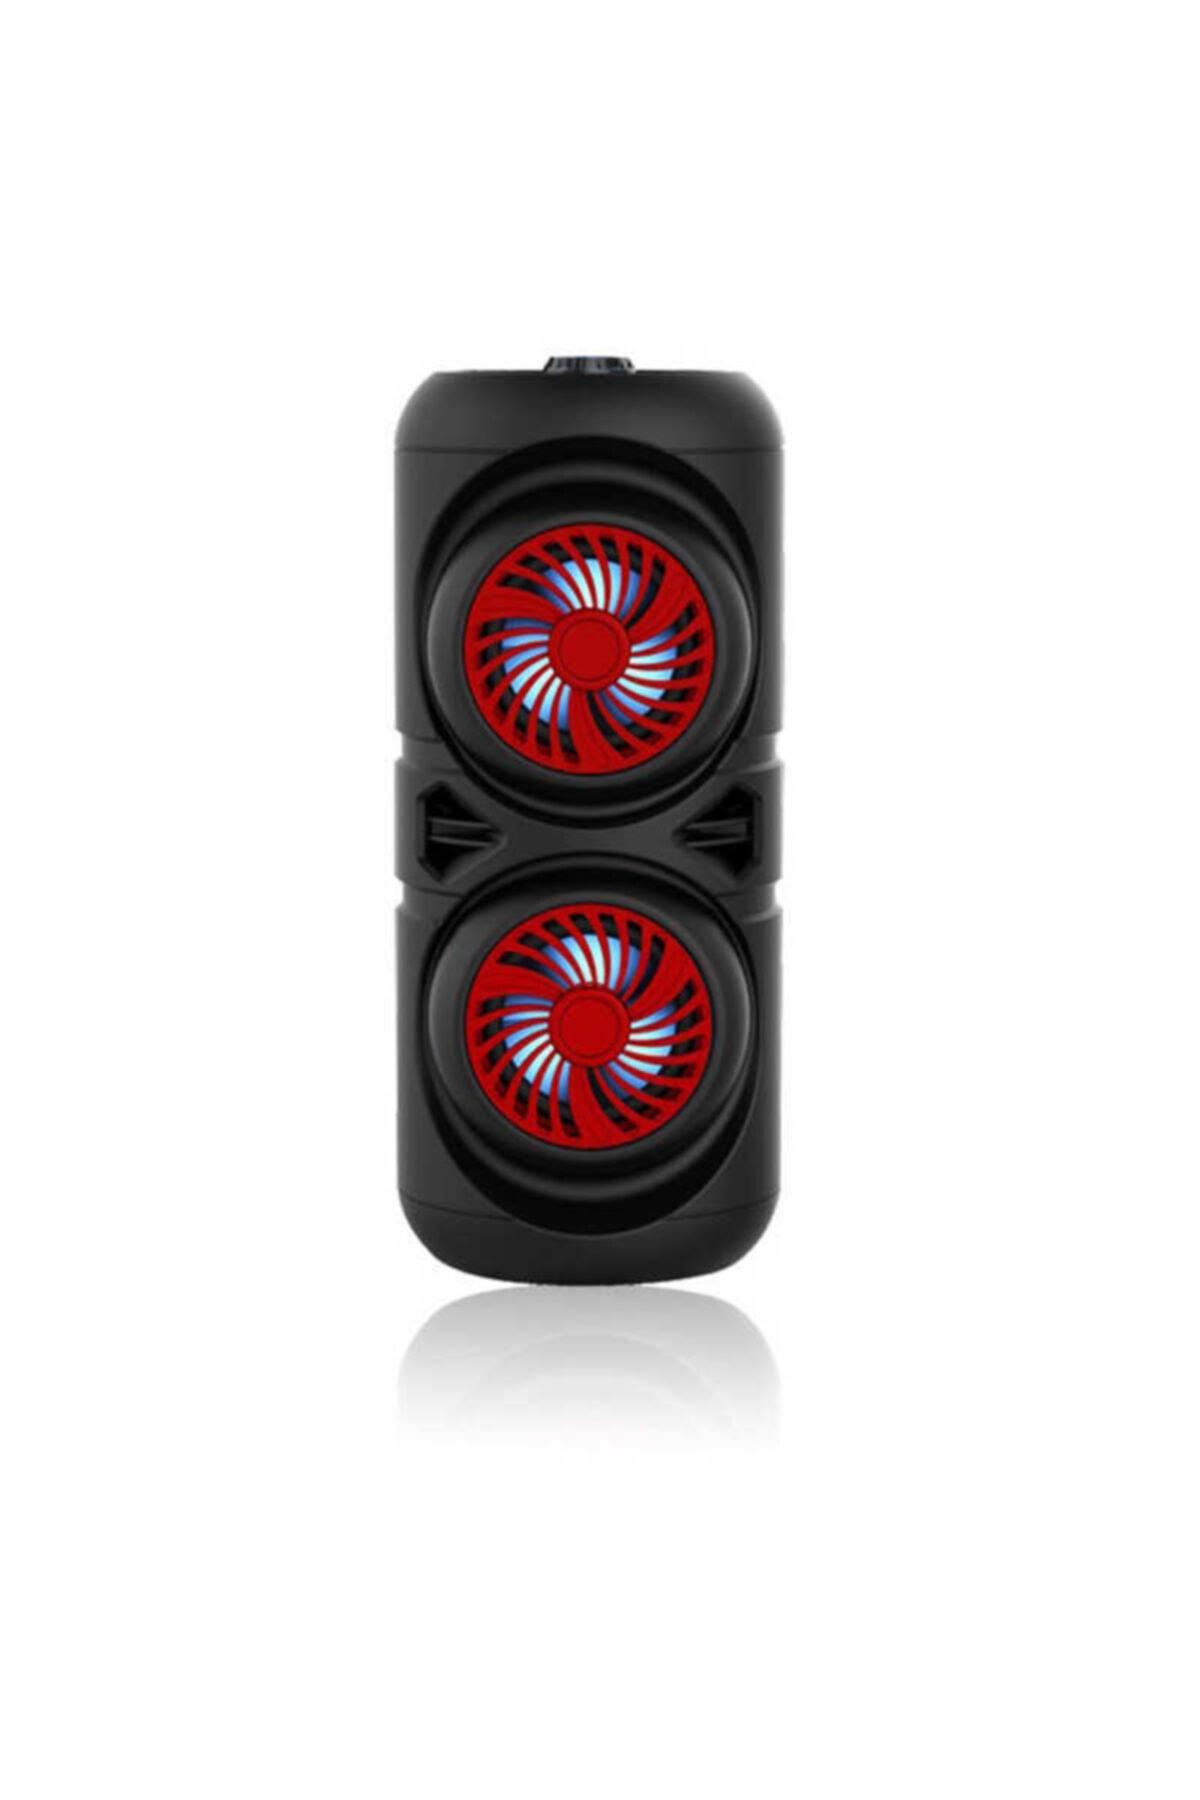 zore ?zqs-4221 Bluetooth Speaker With Fm Radio Renk Kırmızı 1